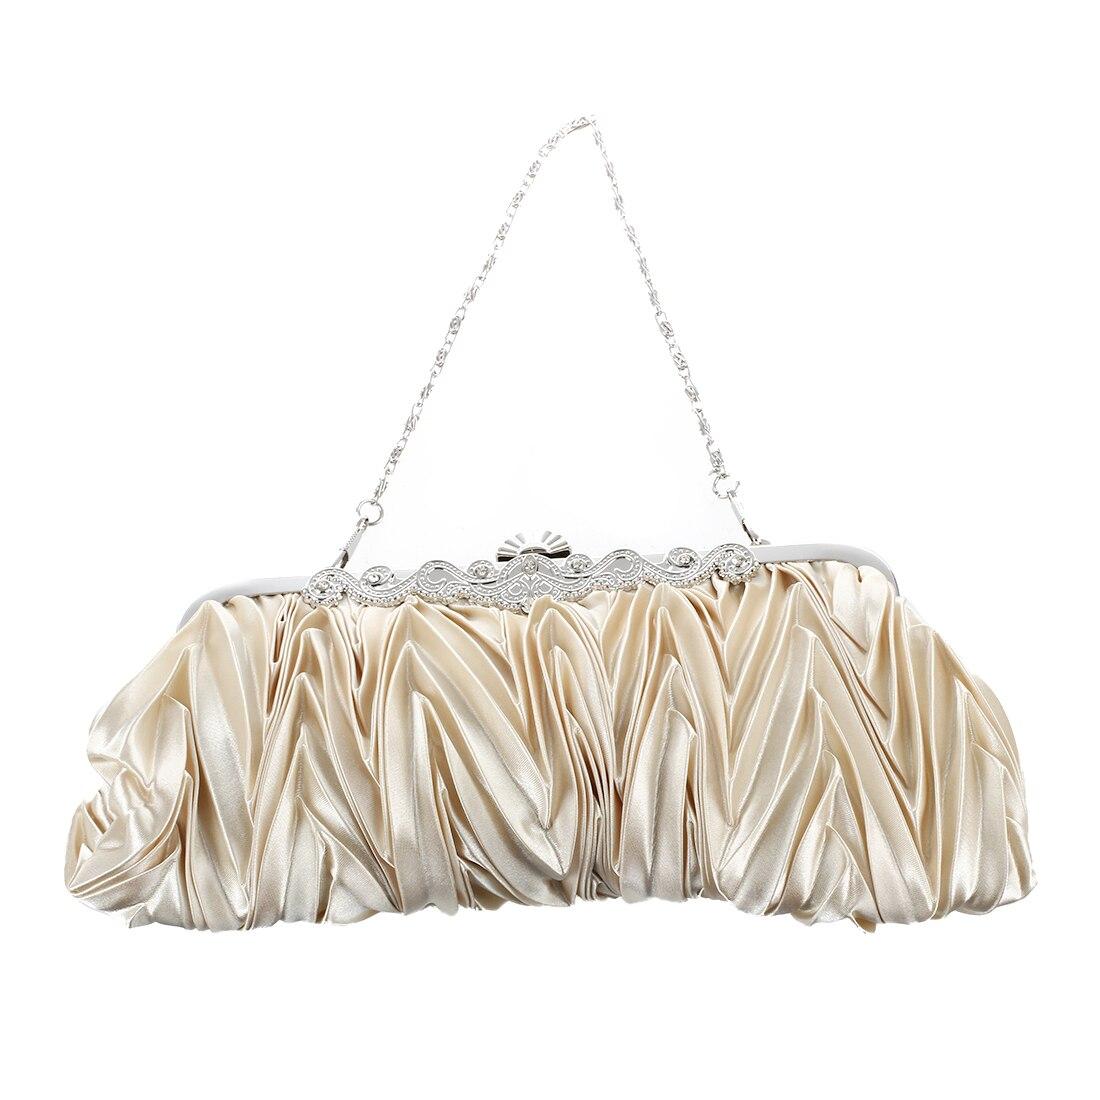 Satin Pleat Ivory Bridal/Evening/Party Clutch Handbag w/ Rhinestones Style аксессуар чехол lg max l bello 2 skinbox slim aw white t f lm 001